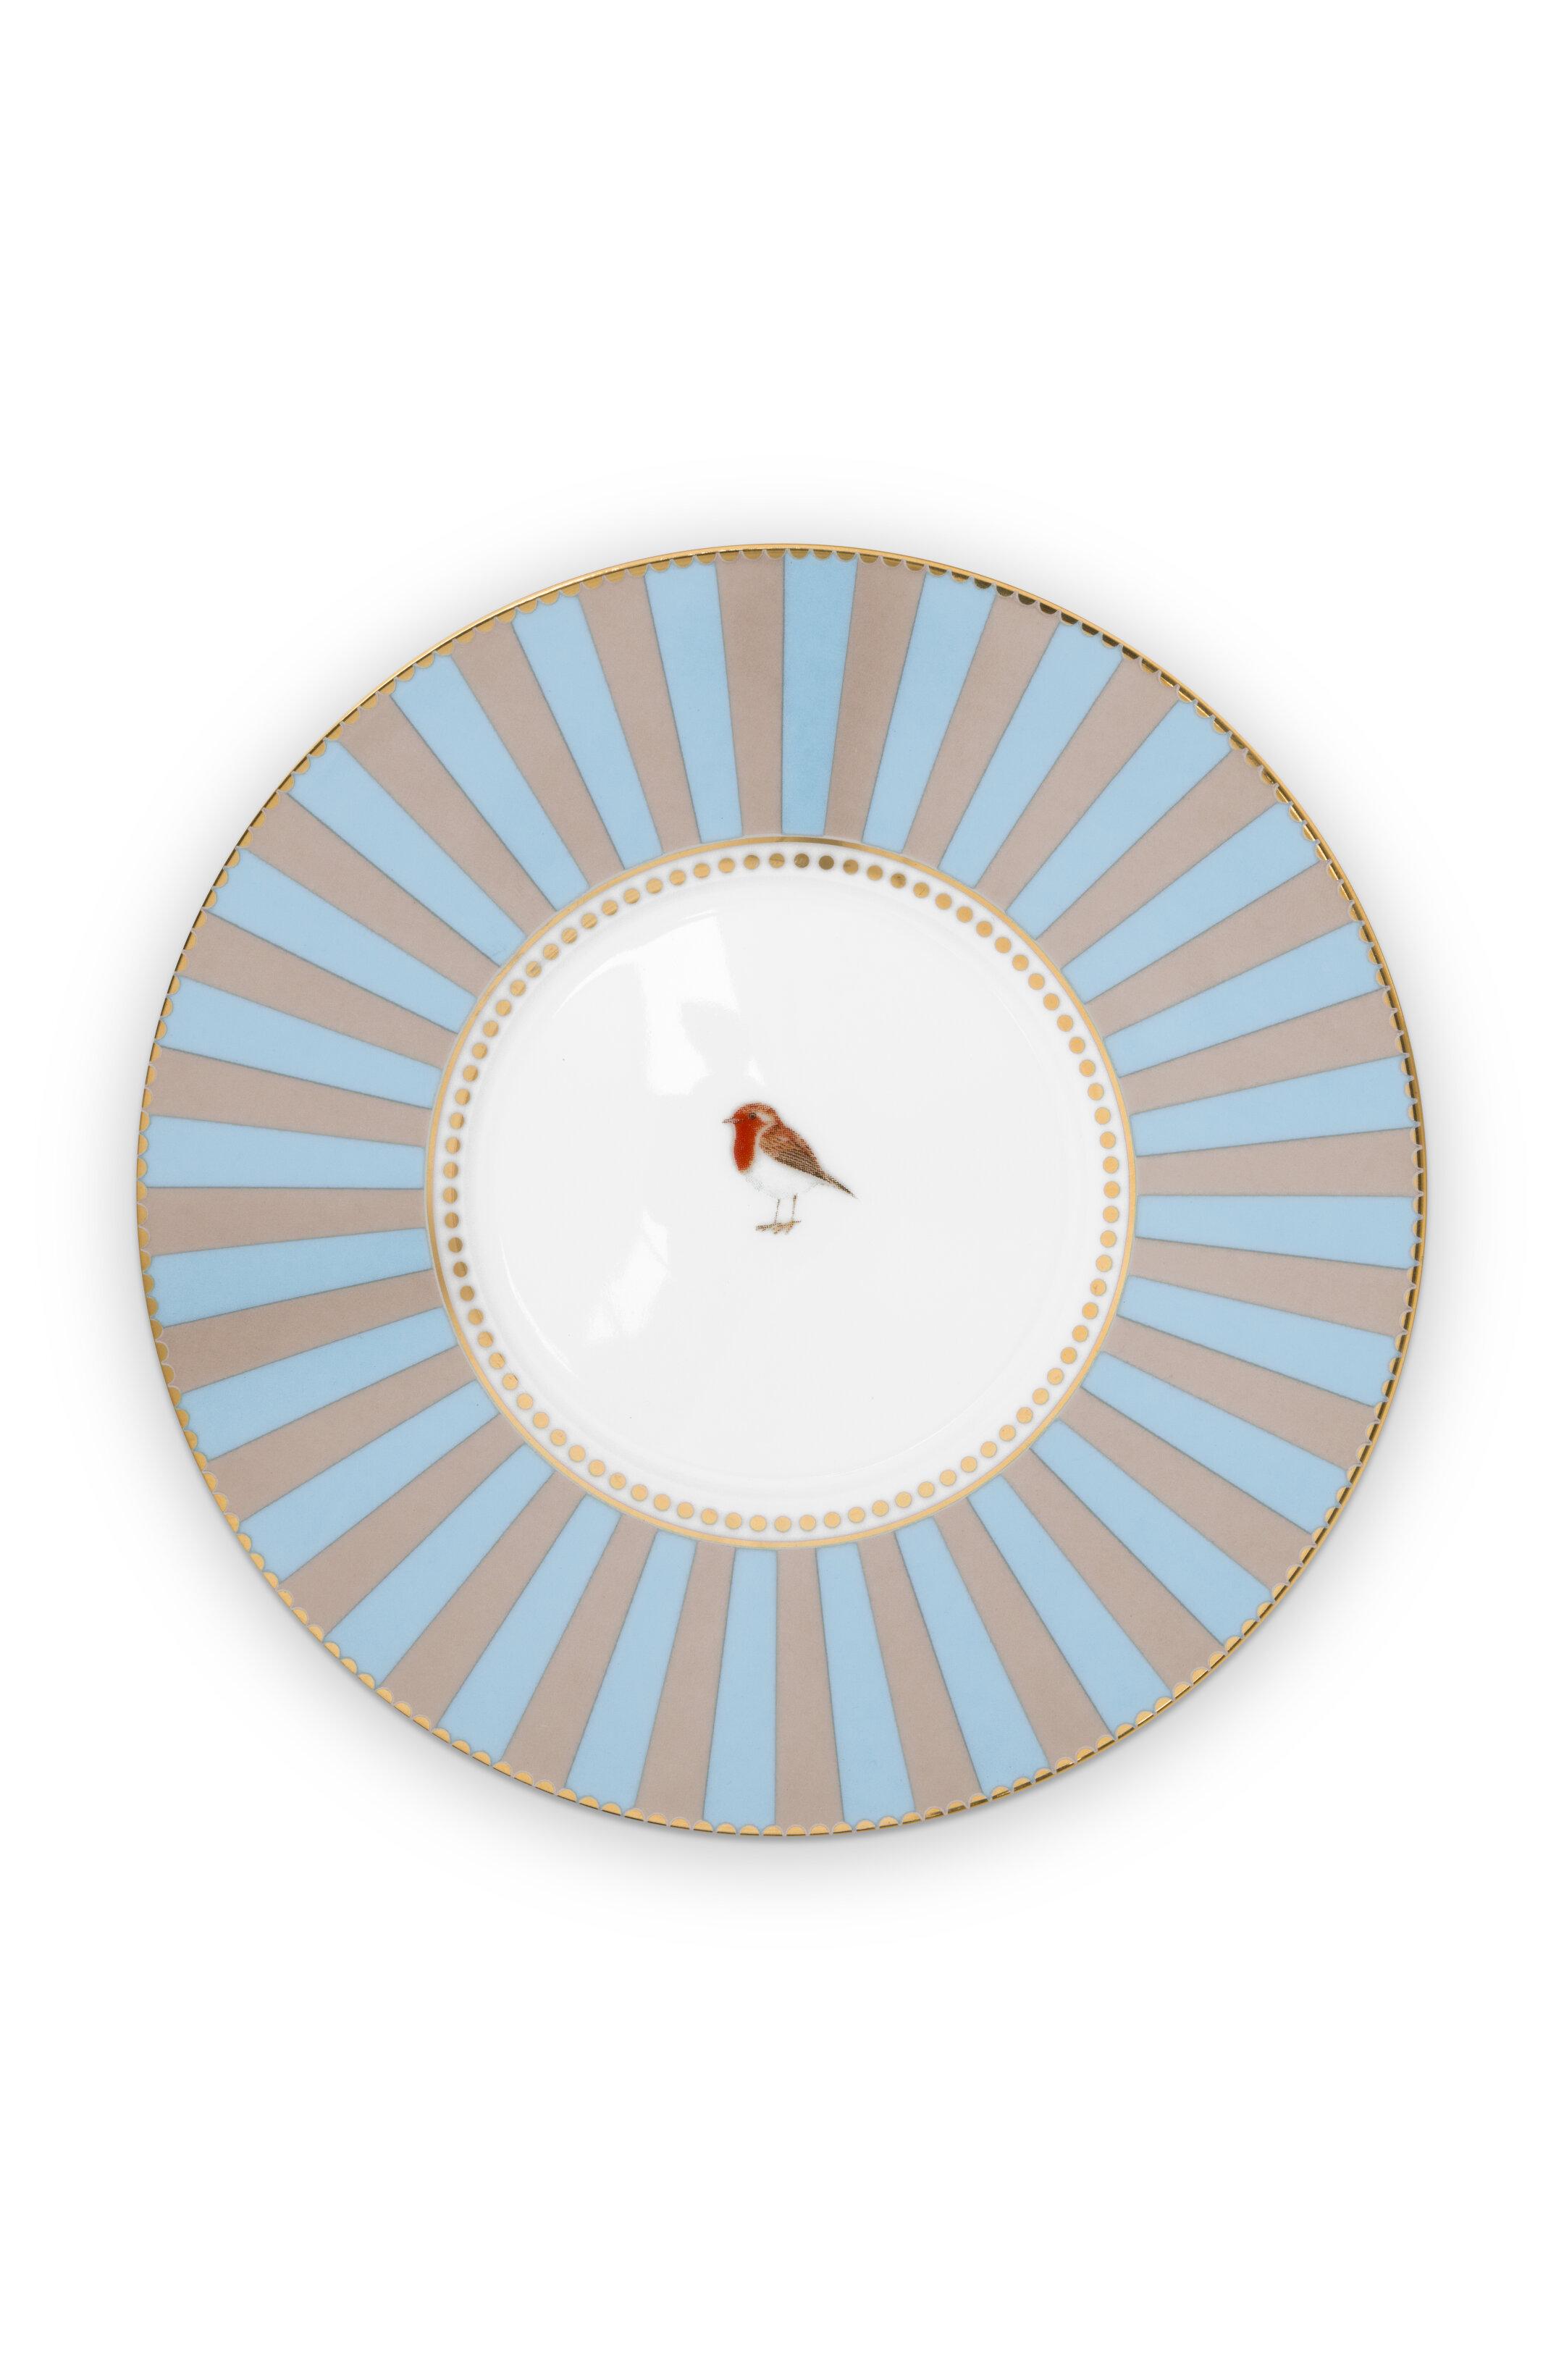 Pip Studio Love Birds Tasse & Untertasse Medaillon Blau-Khaki